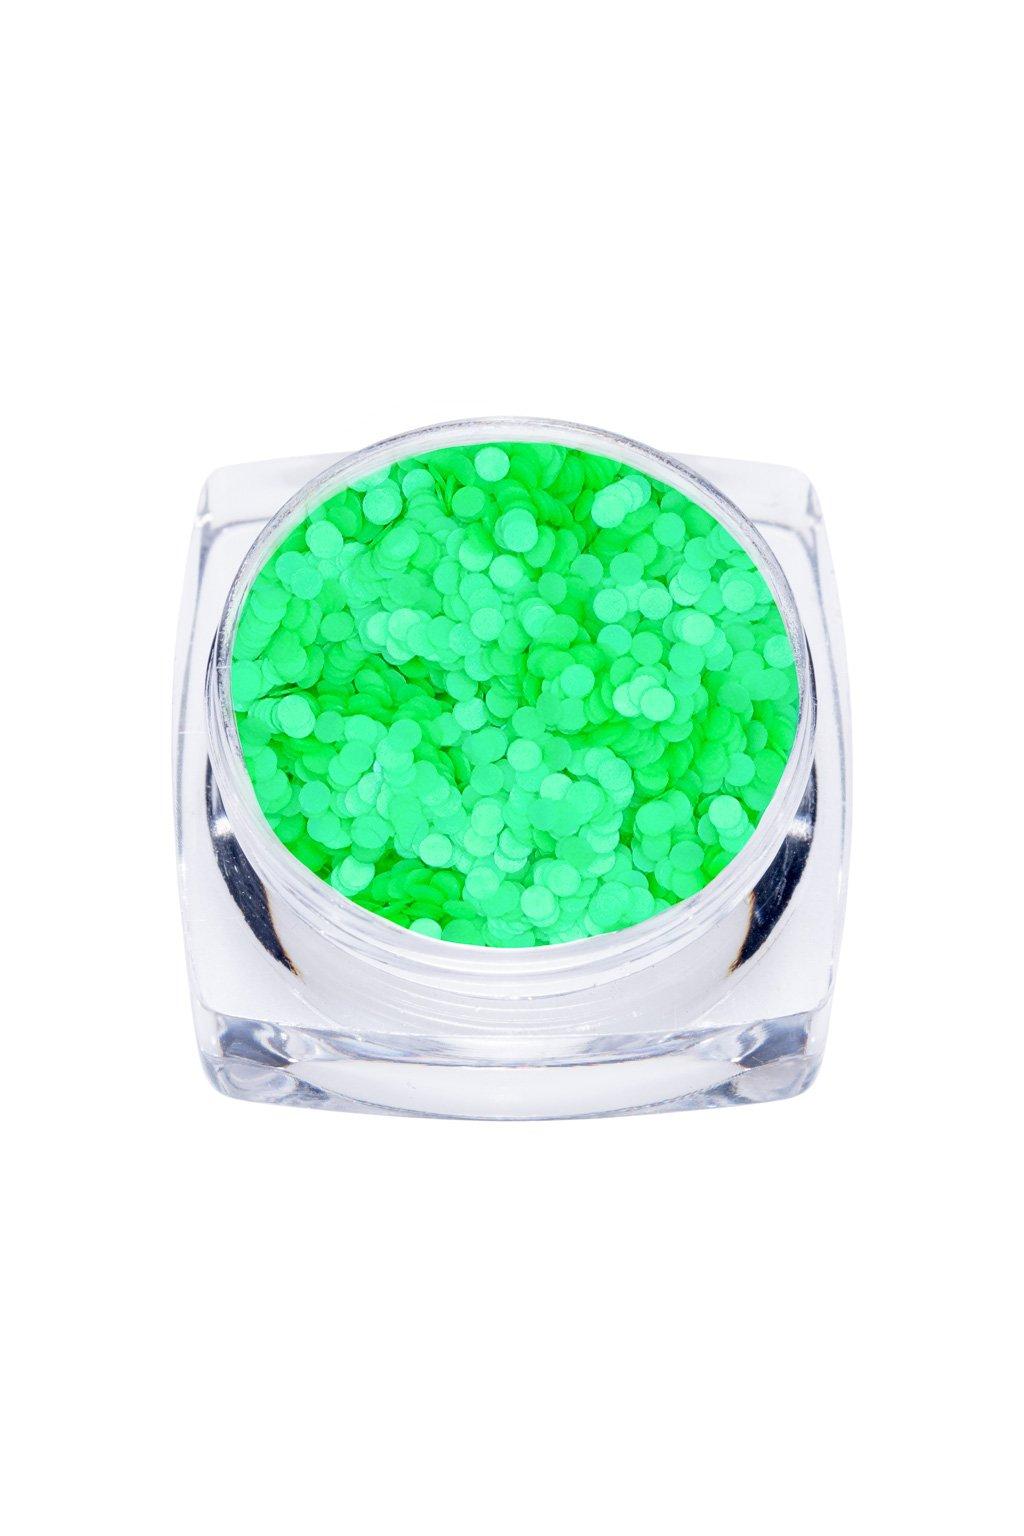 23981 minipihy neon green 1mm